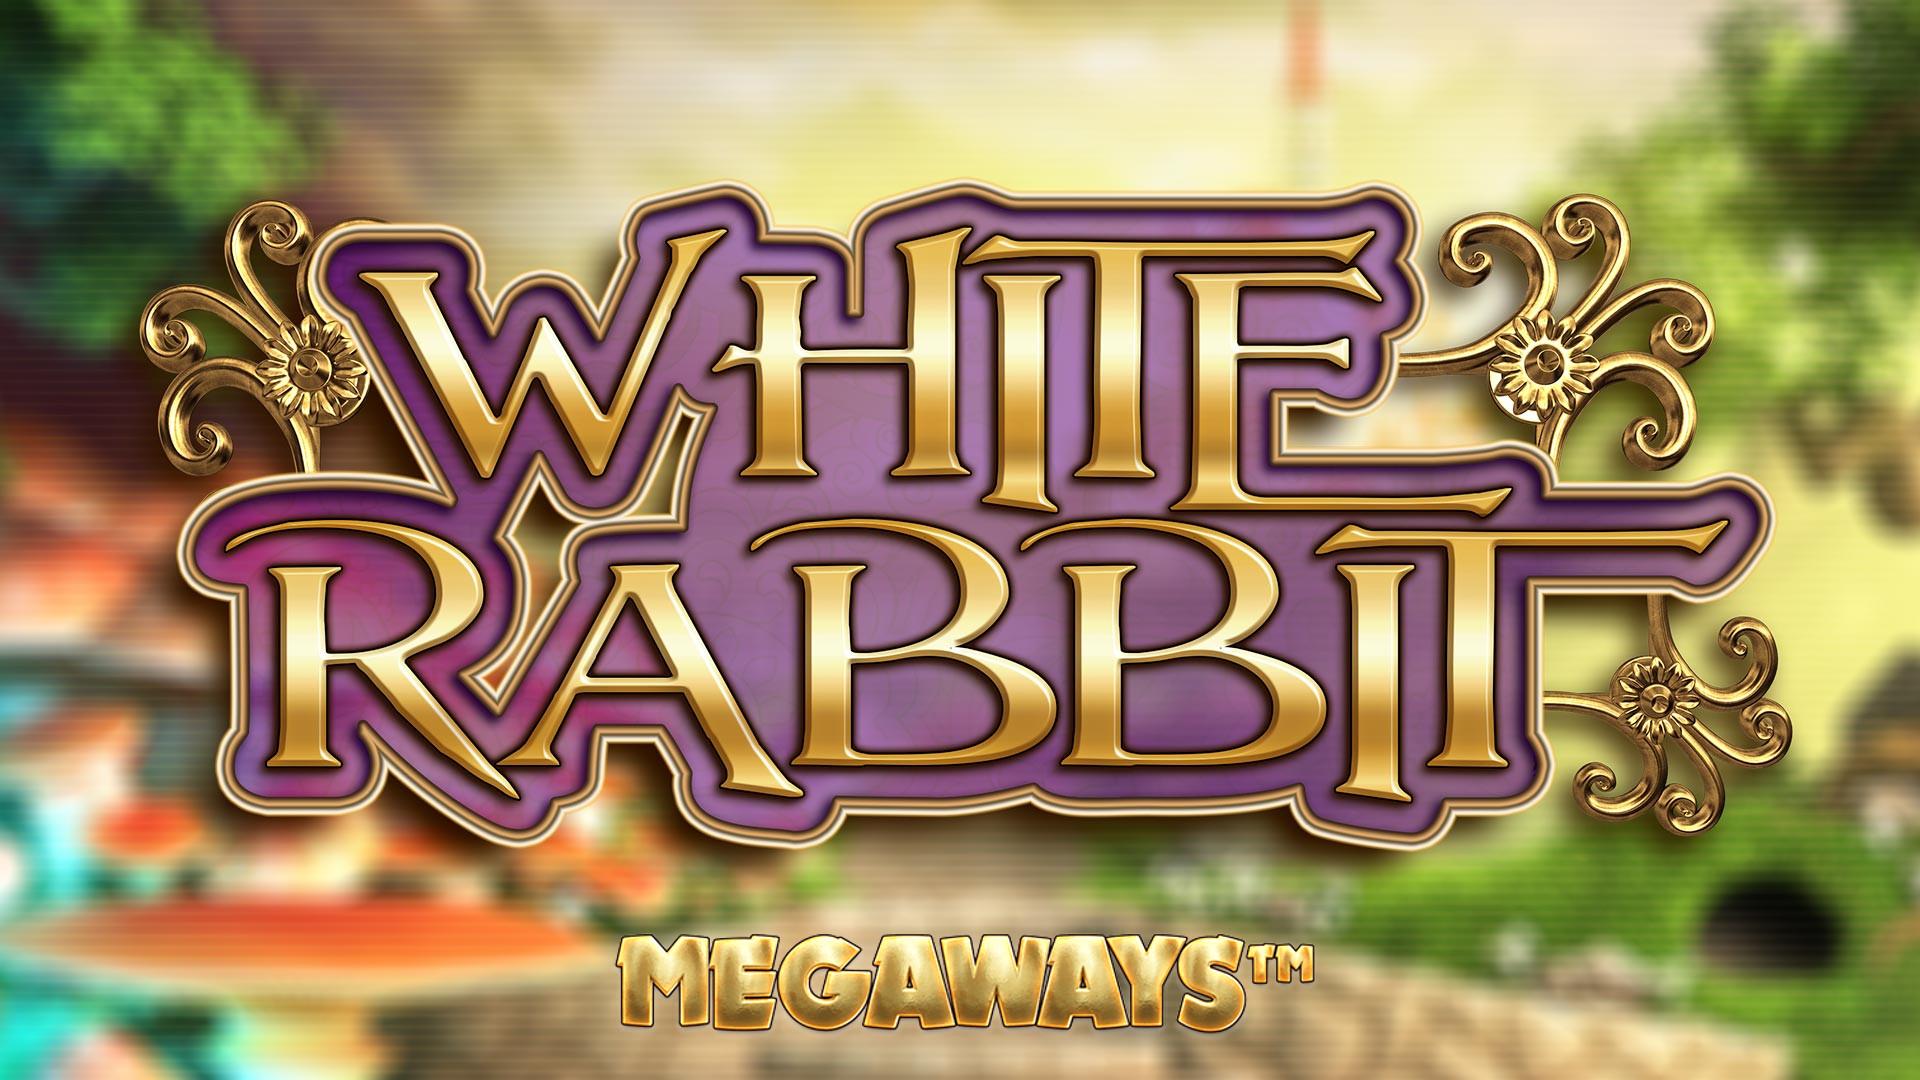 White Rabbit Megaways - DaisySlots